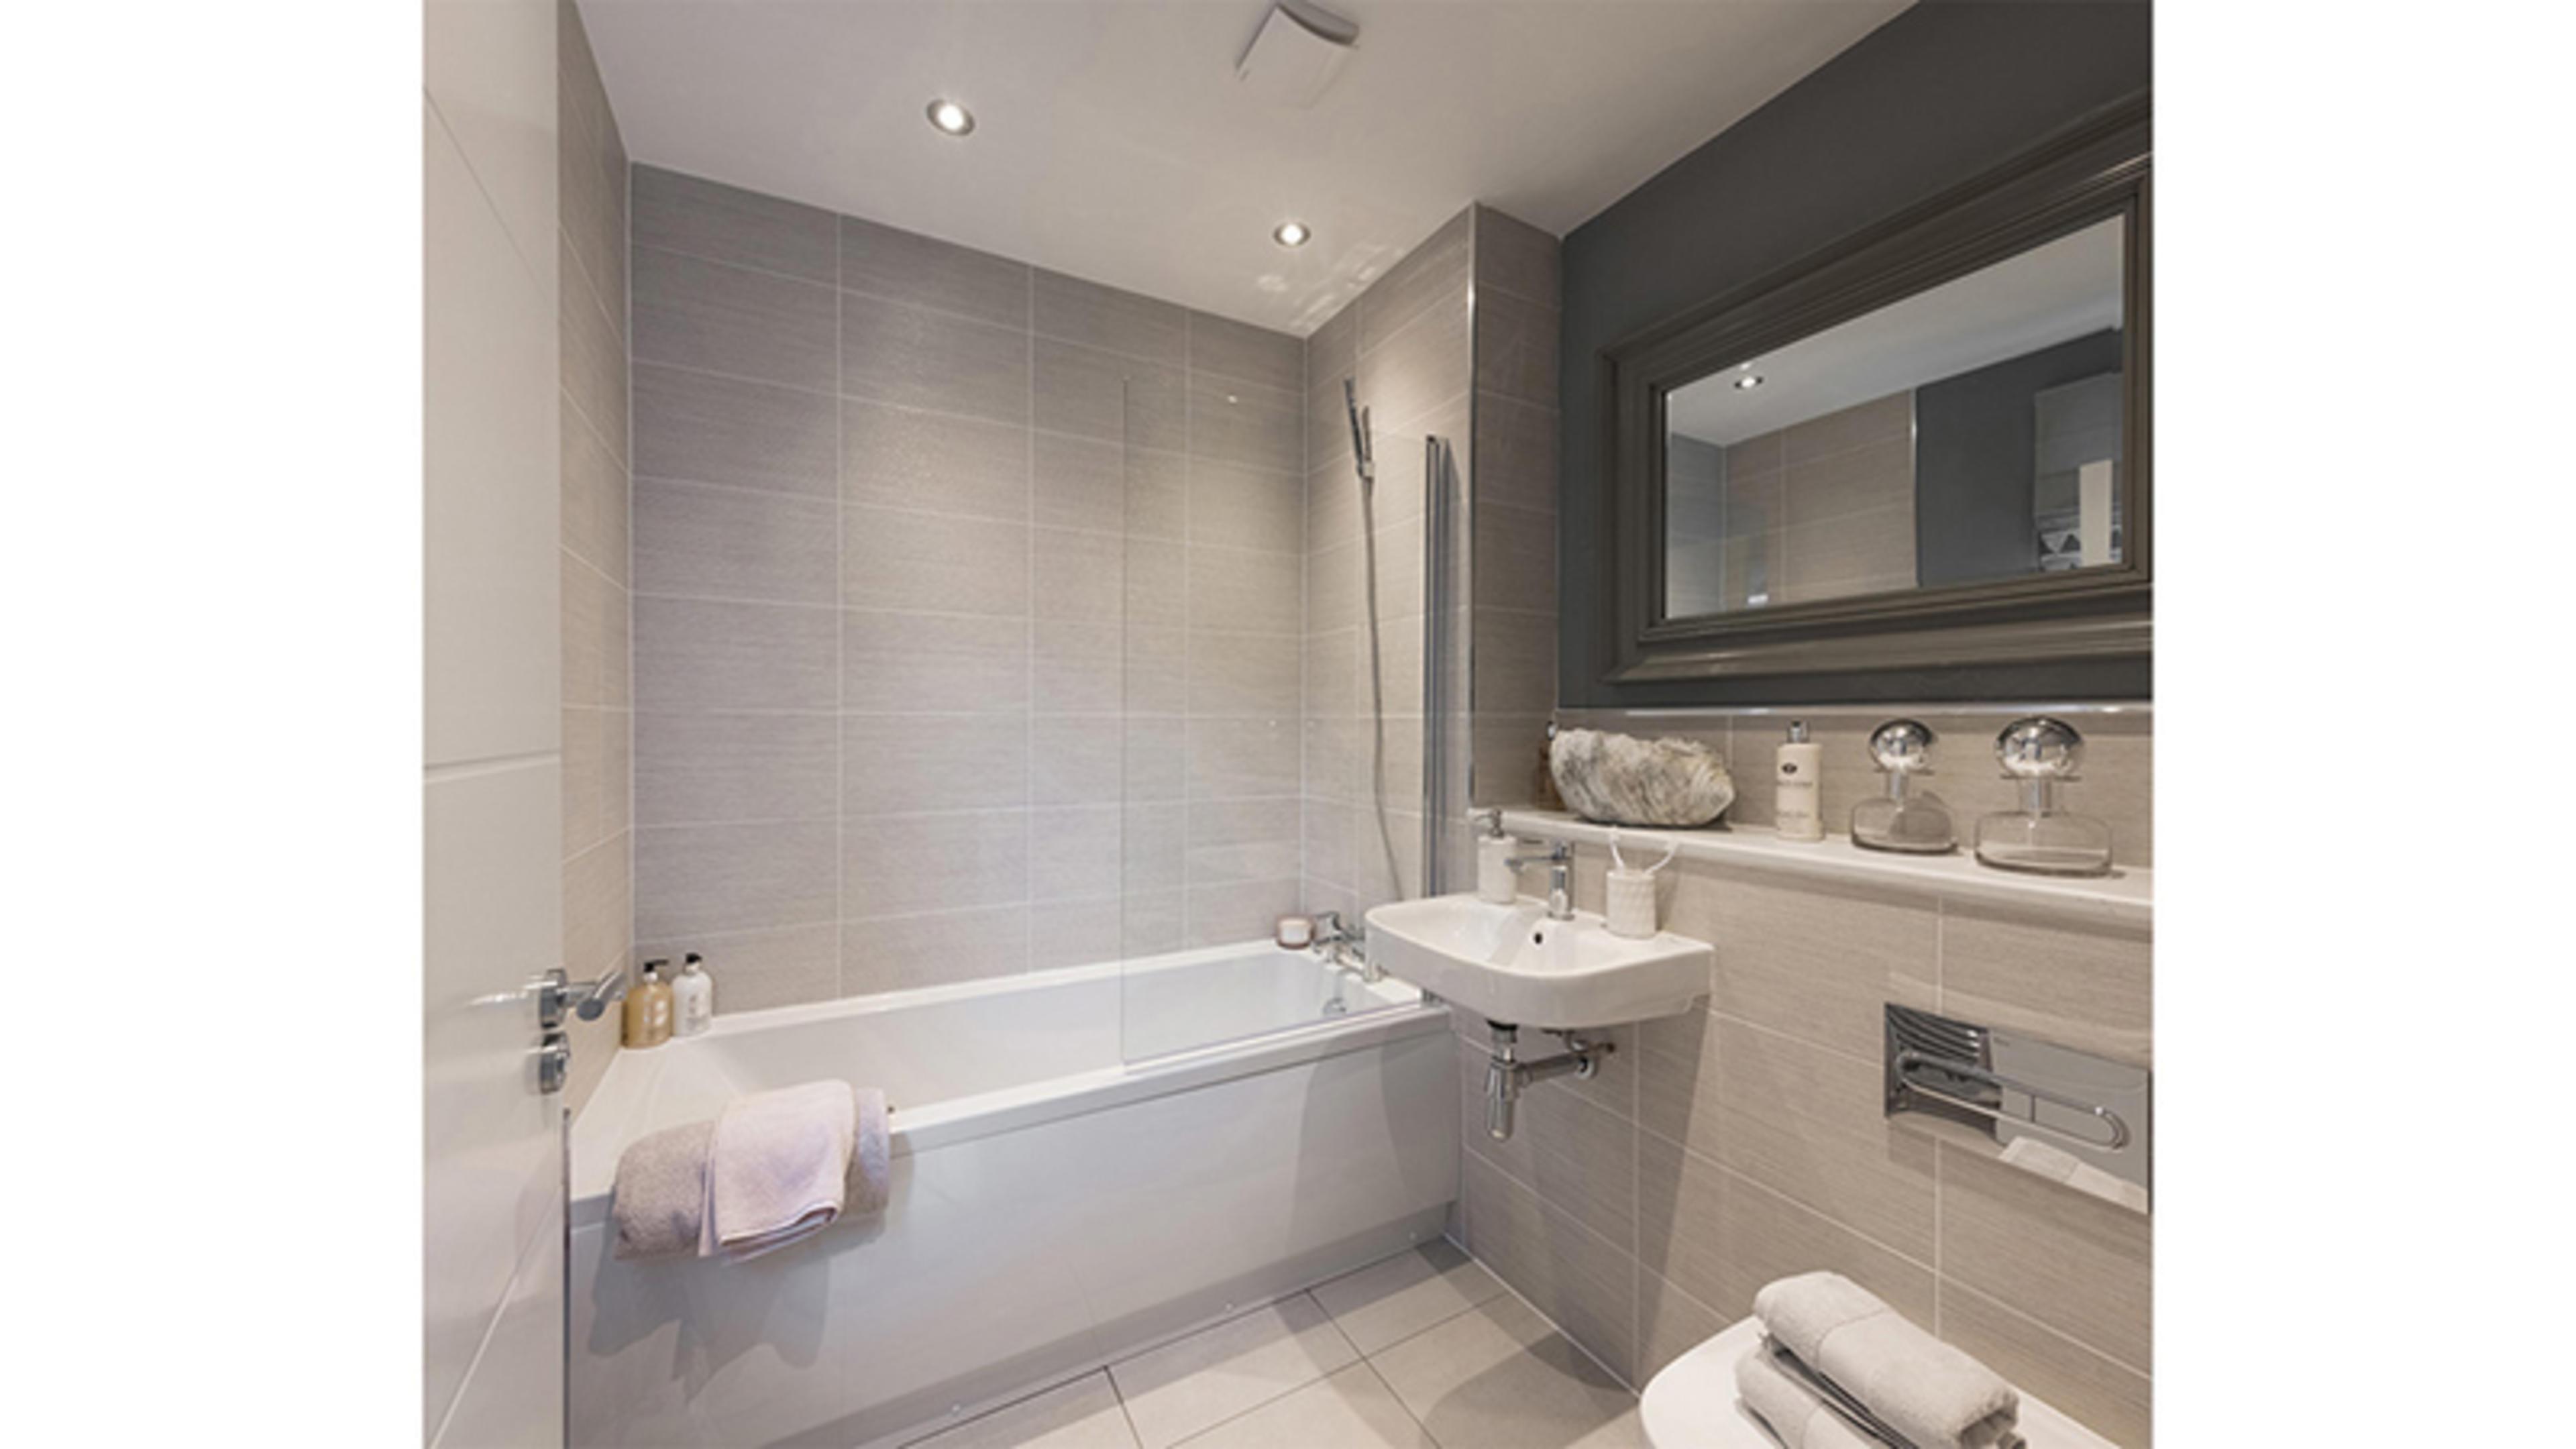 watling-grange-harrogate-calder-3-bed-home-bathroom-bordered-1